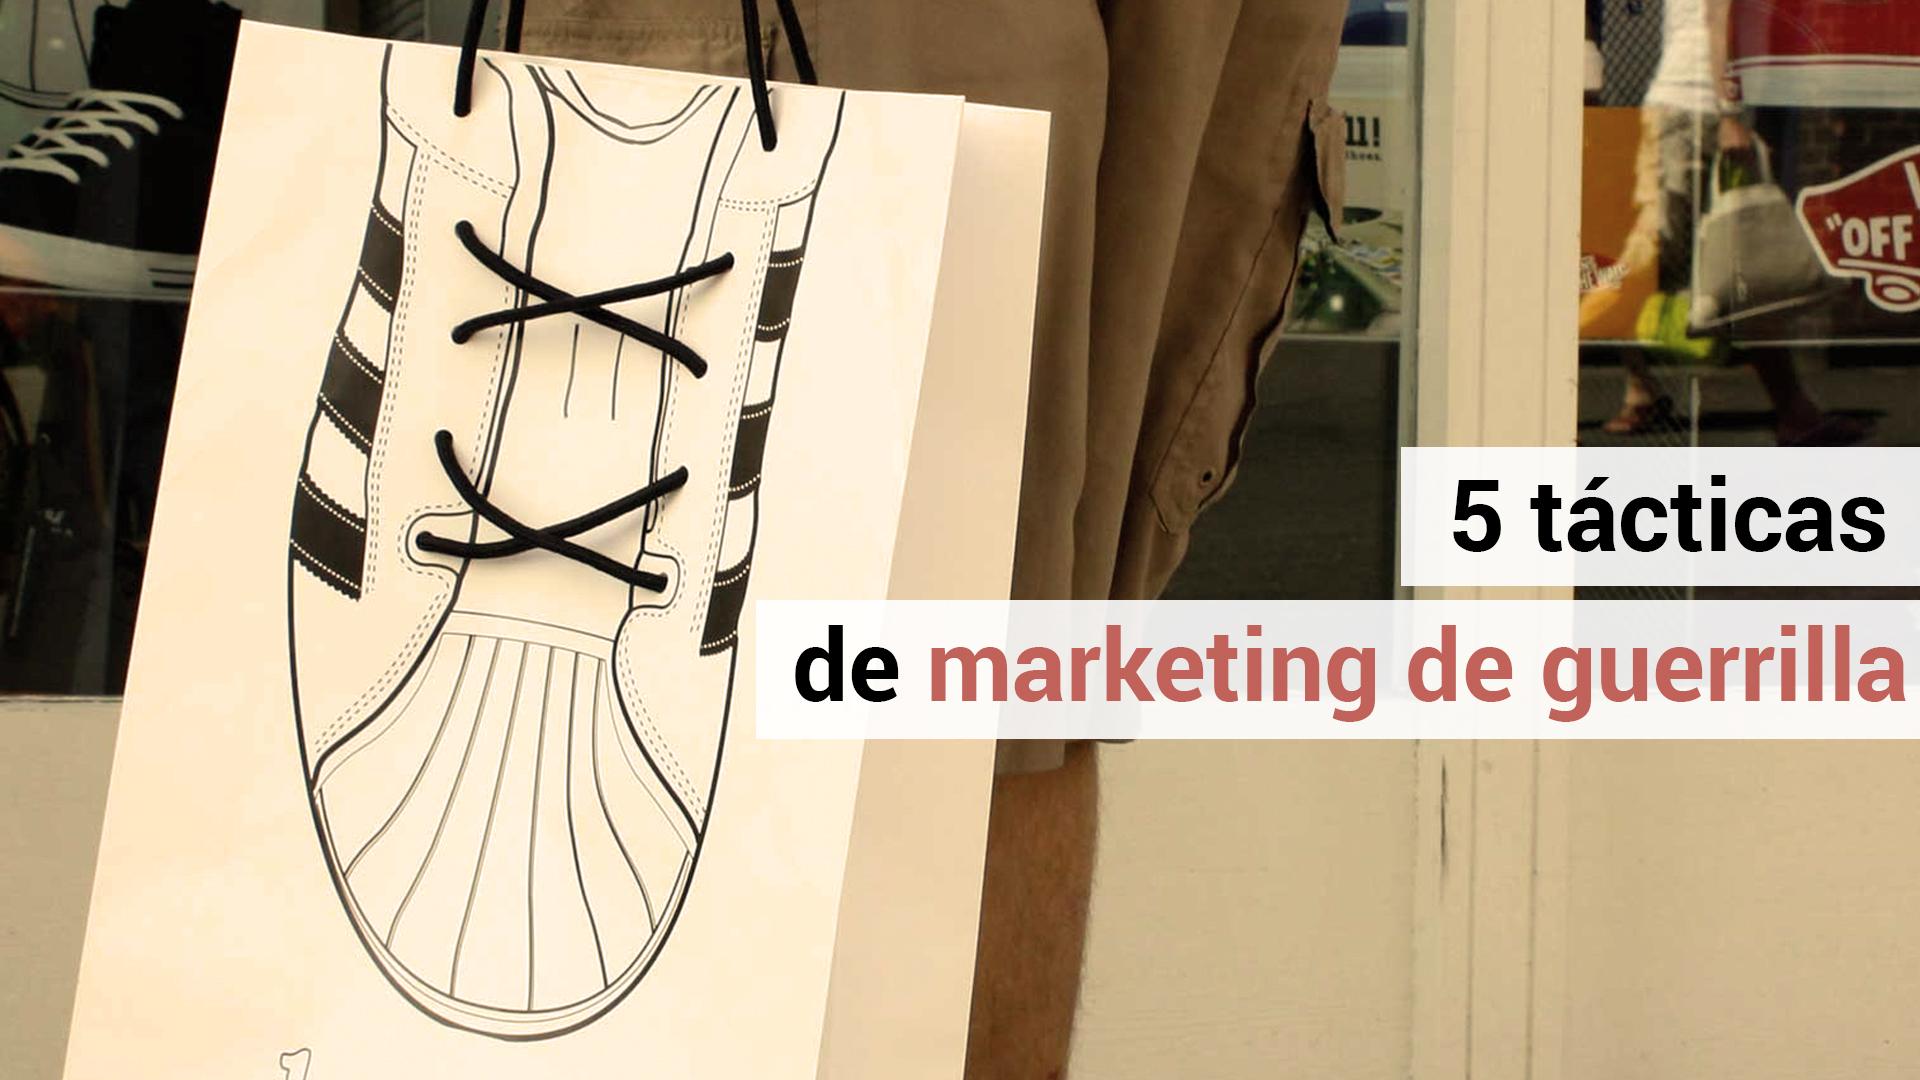 5 tácticas de marketing de guerrilla